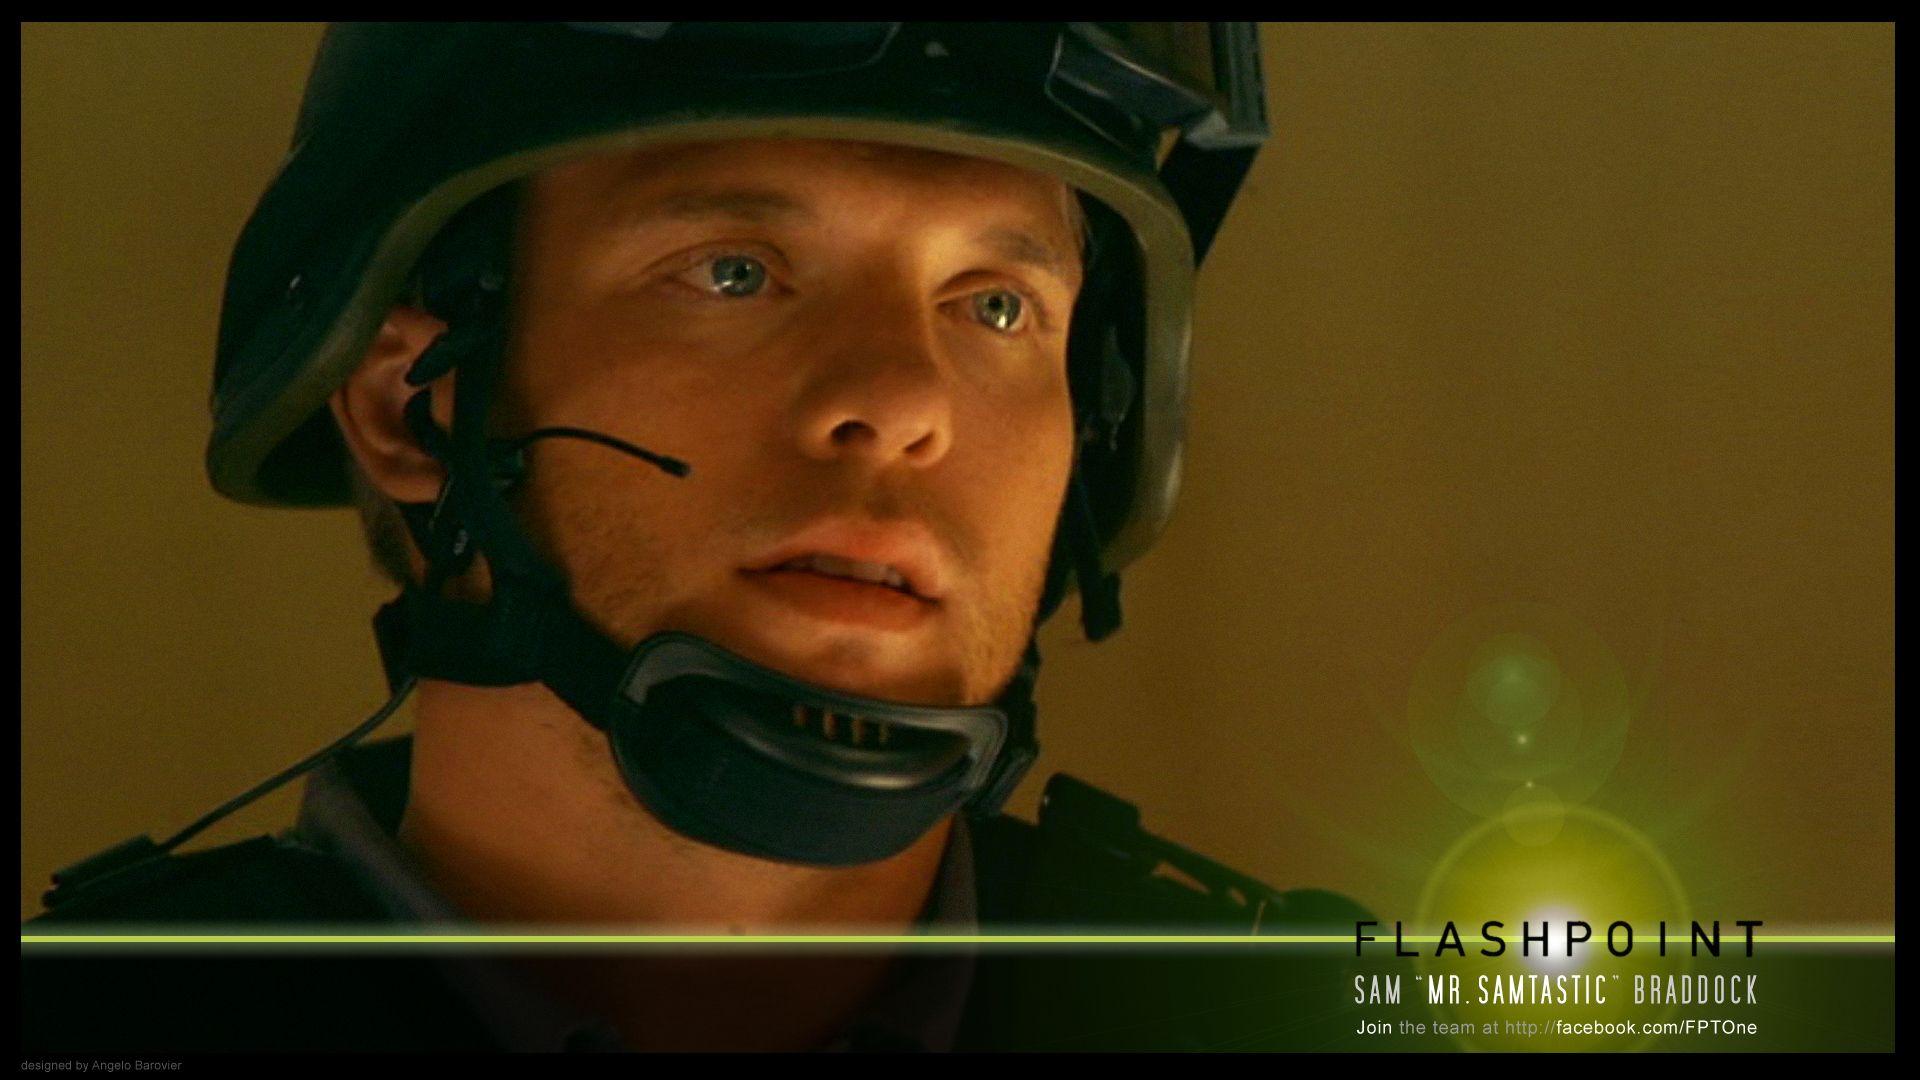 Sam Braddock... Played Sam Braddock